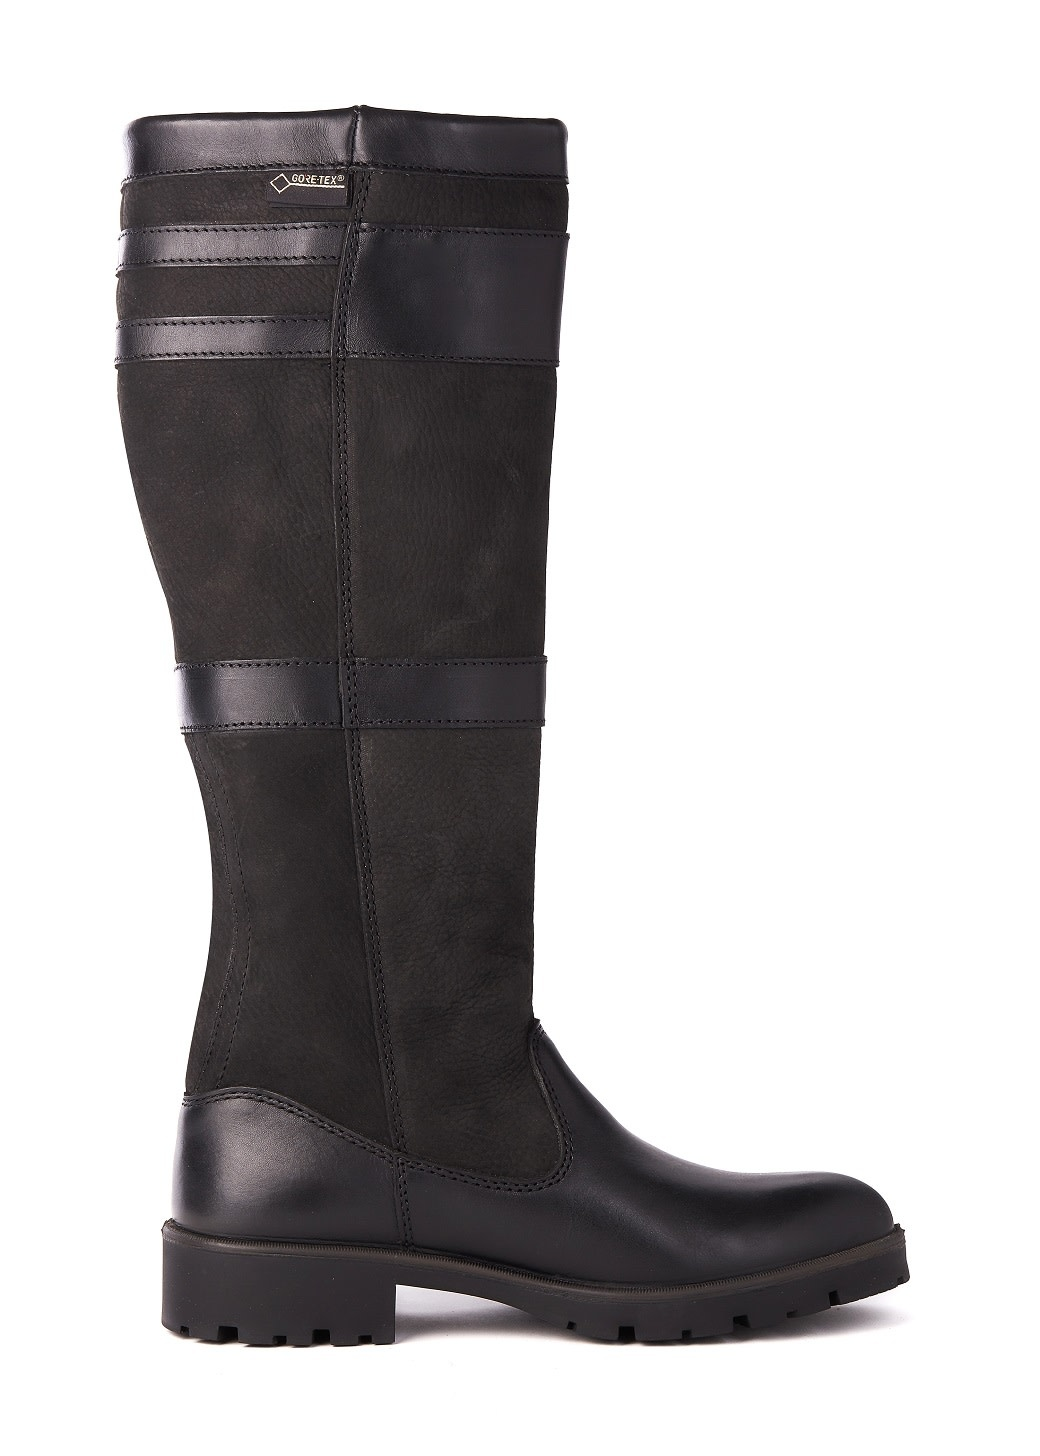 Dubarry Longford - Black-5